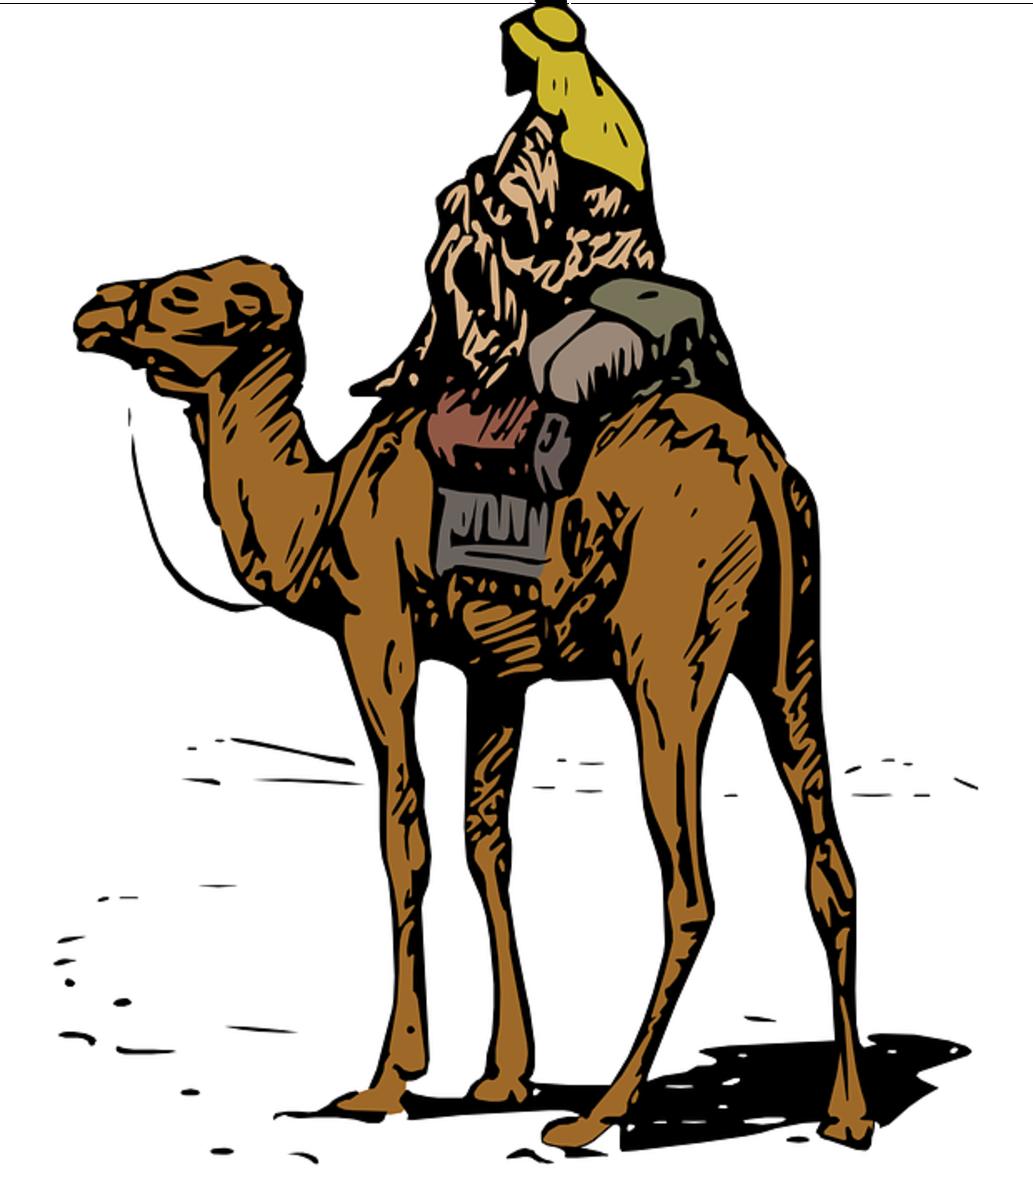 Bedoin on a Camel